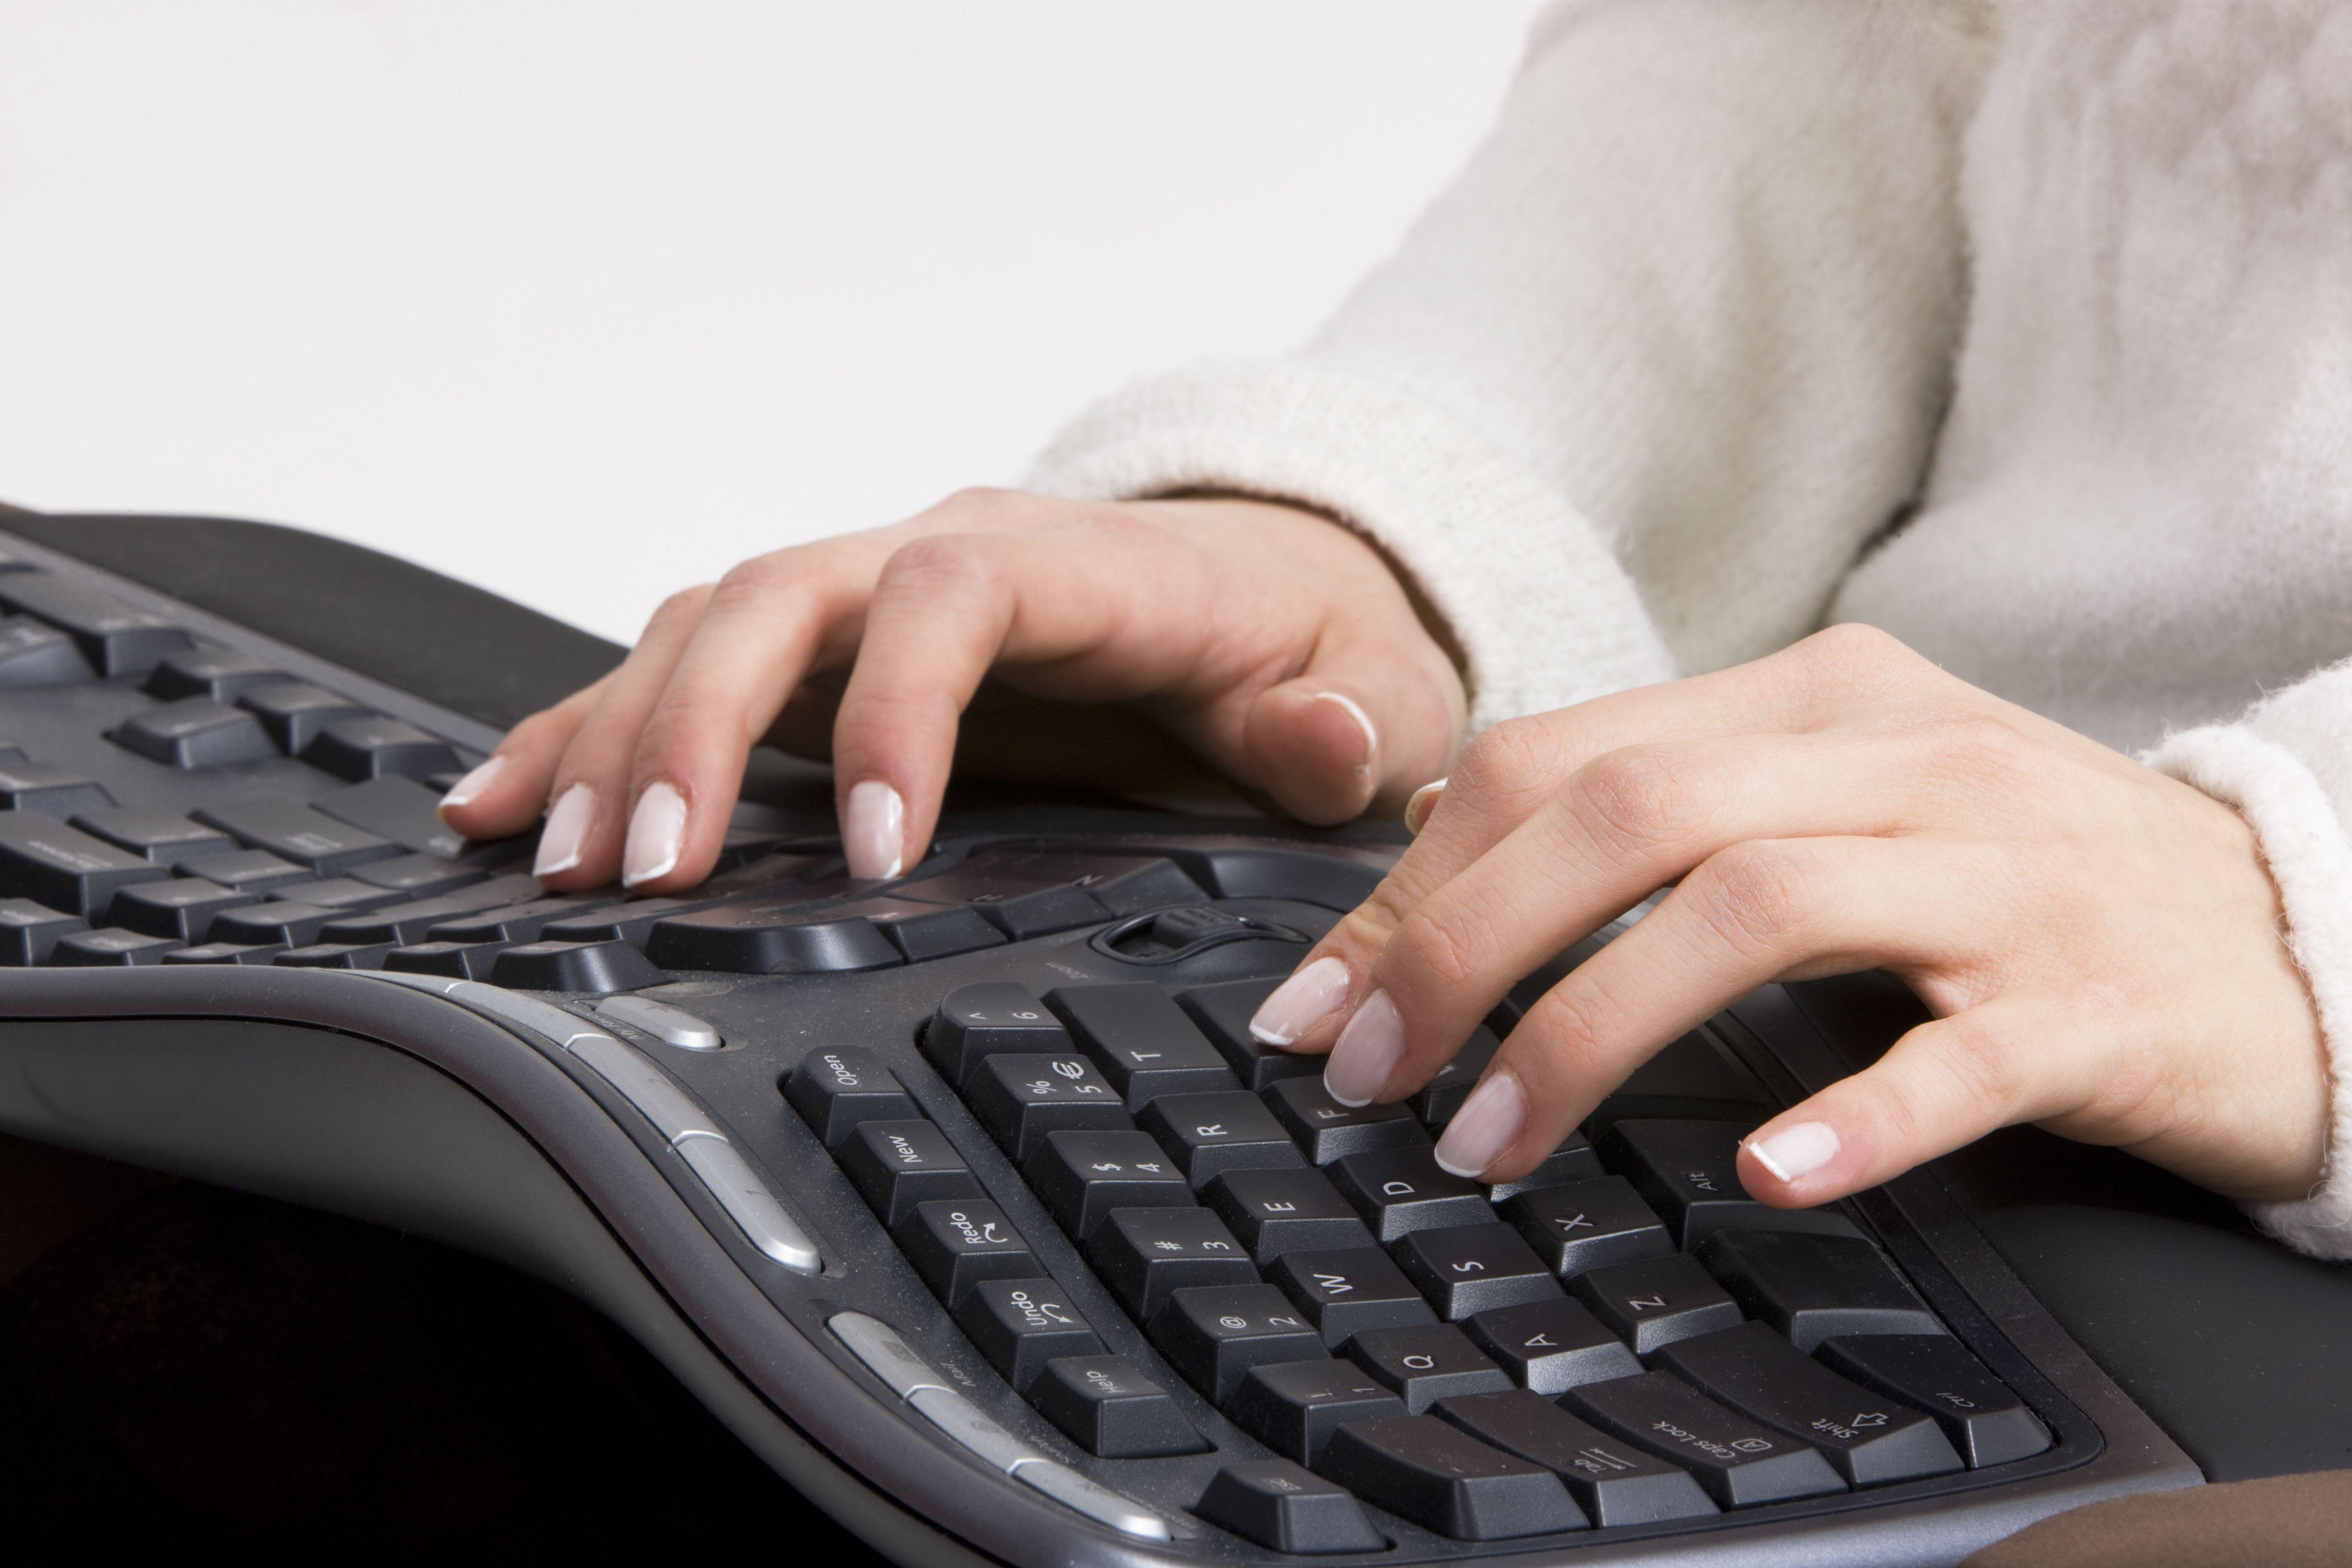 hands typing on ergonomic keyboard